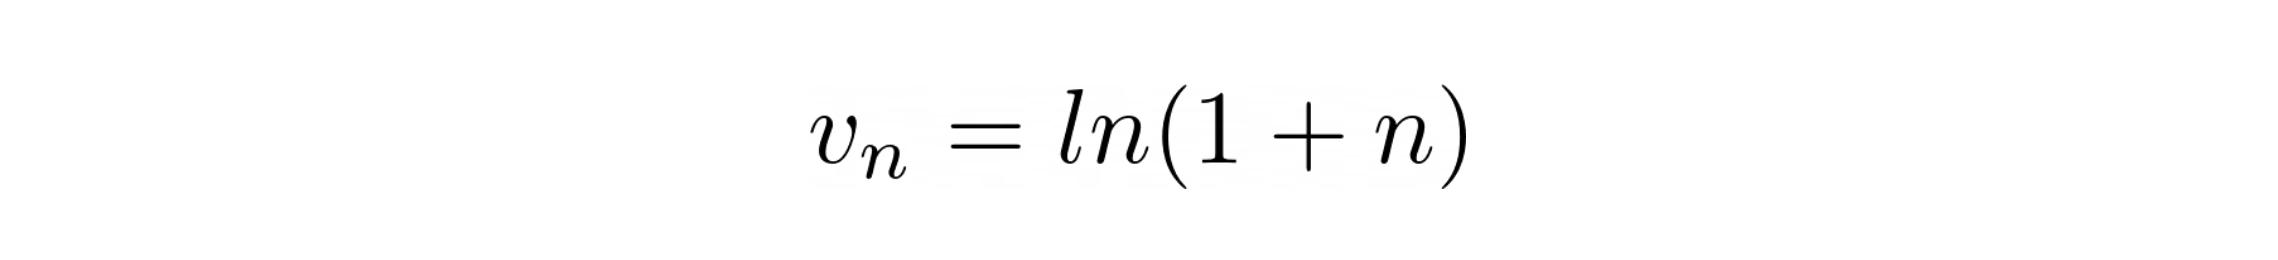 value in counter Morris' algorithm